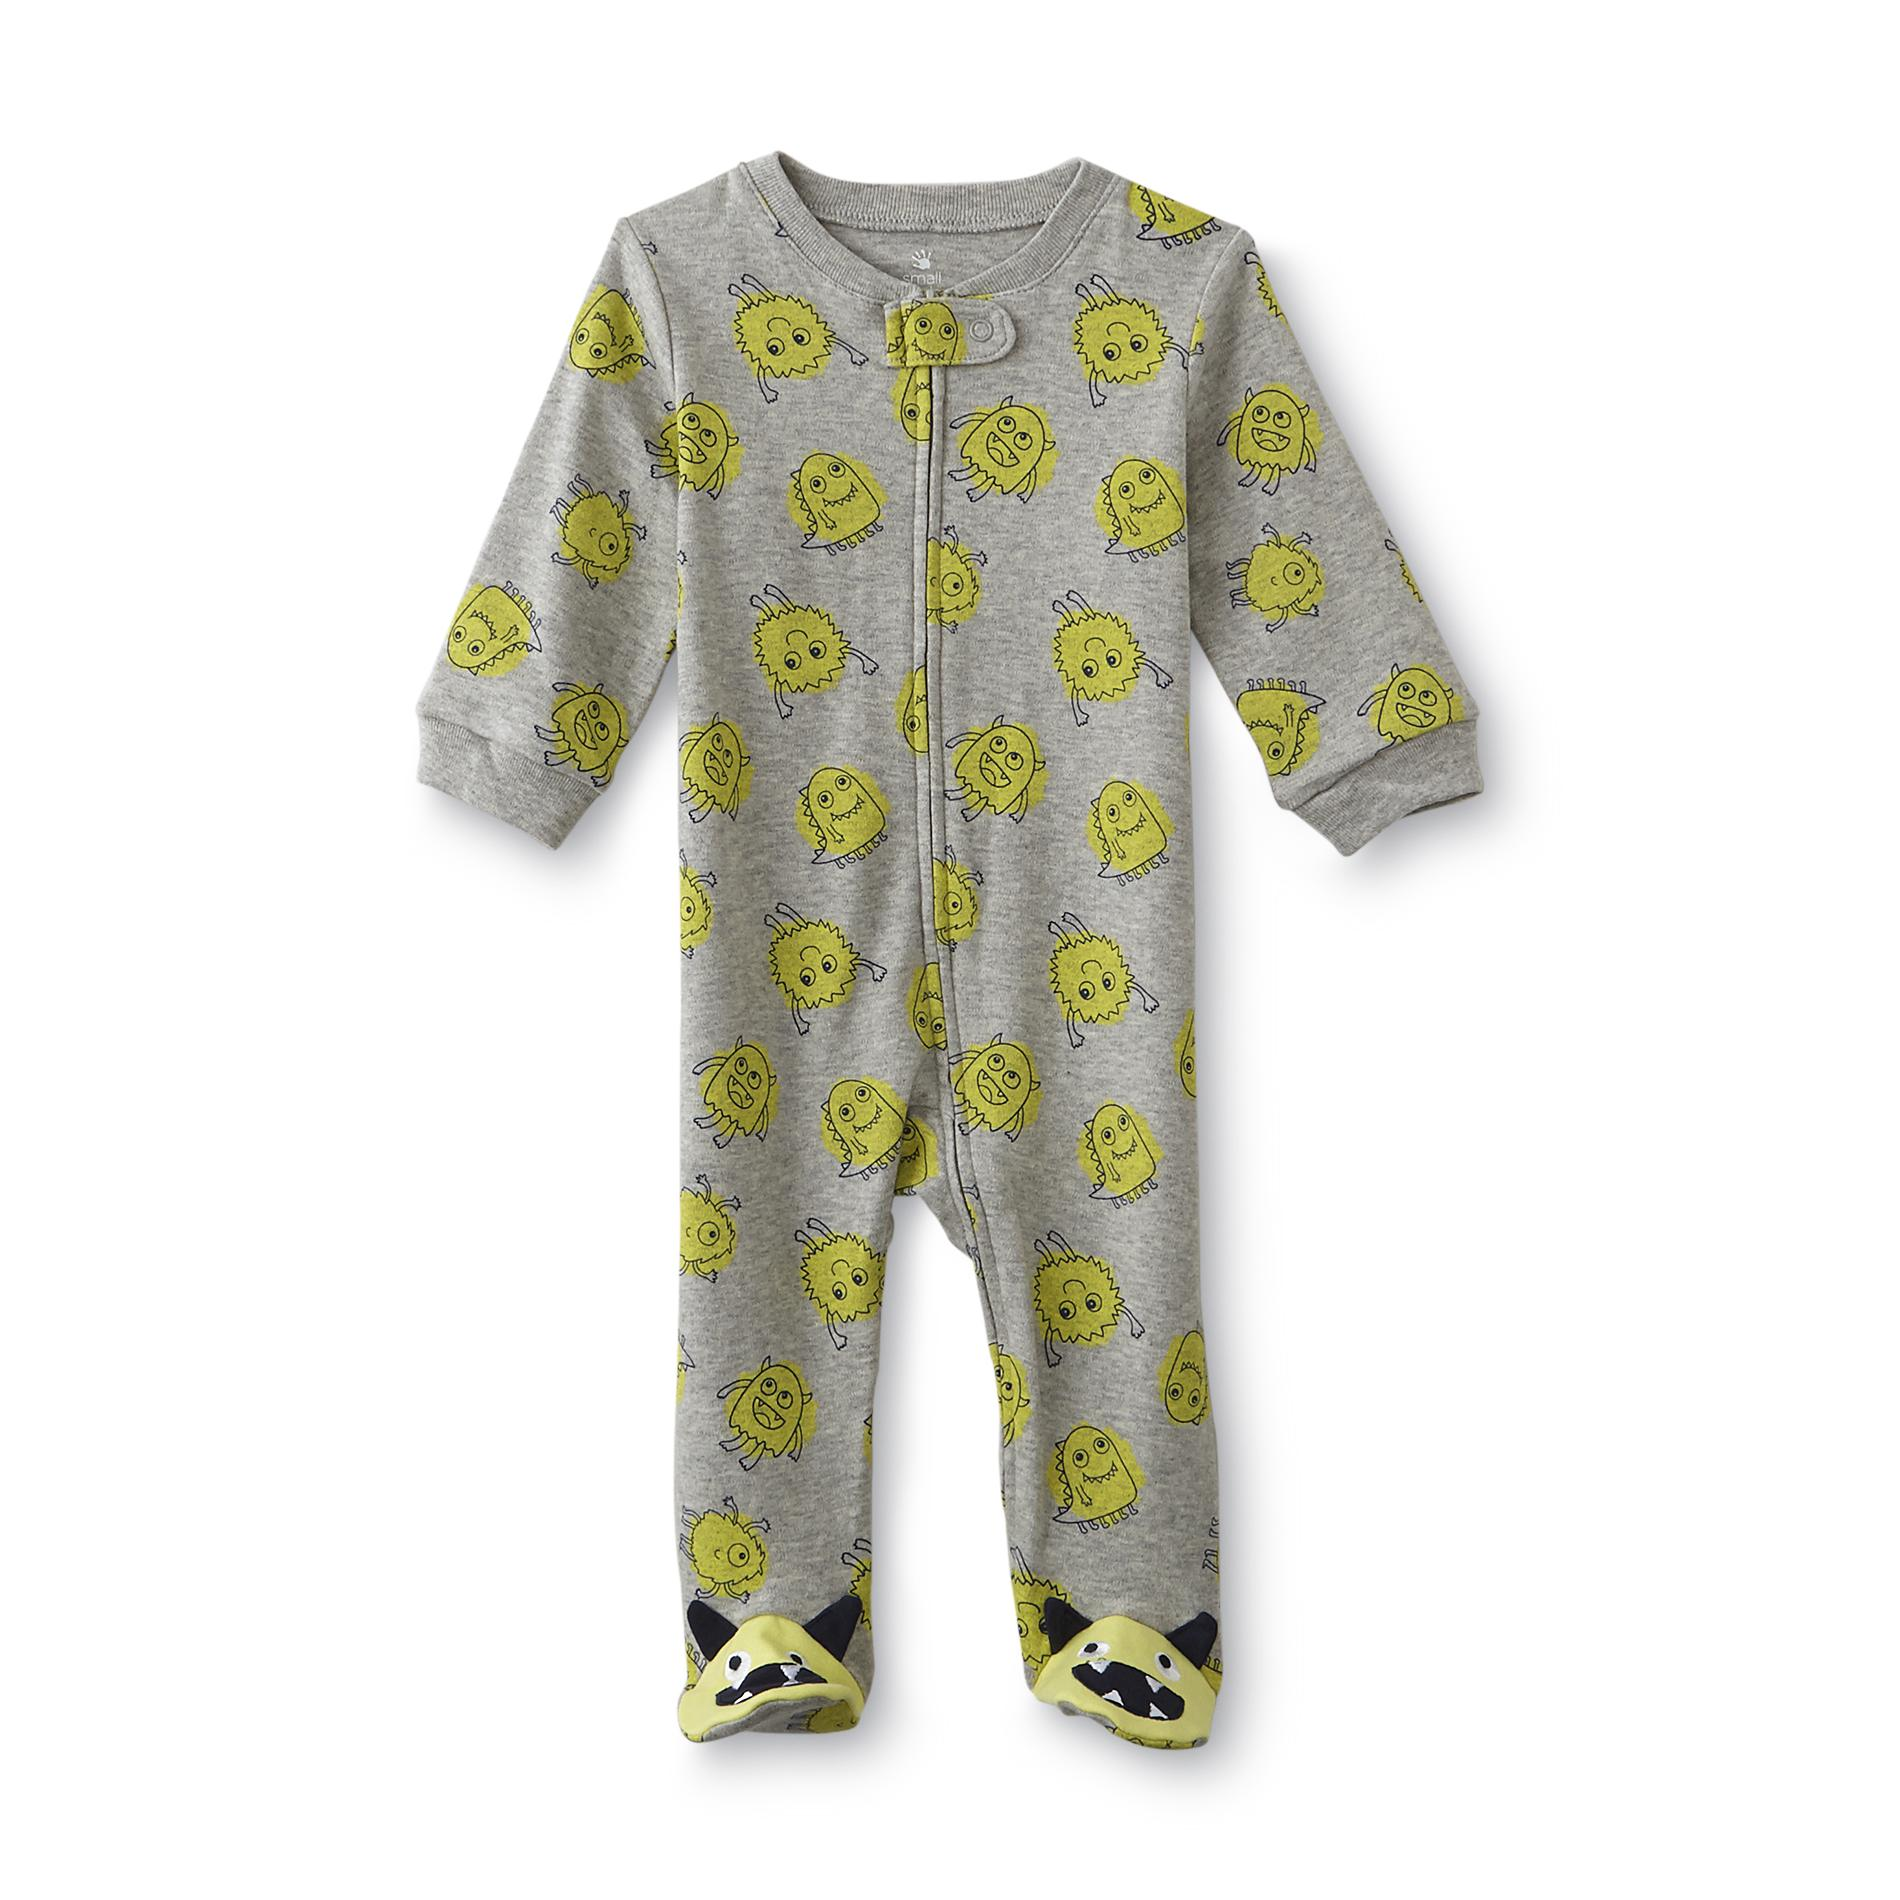 Small Wonders Newborn Boy's Sleeper Pajamas - Monsters